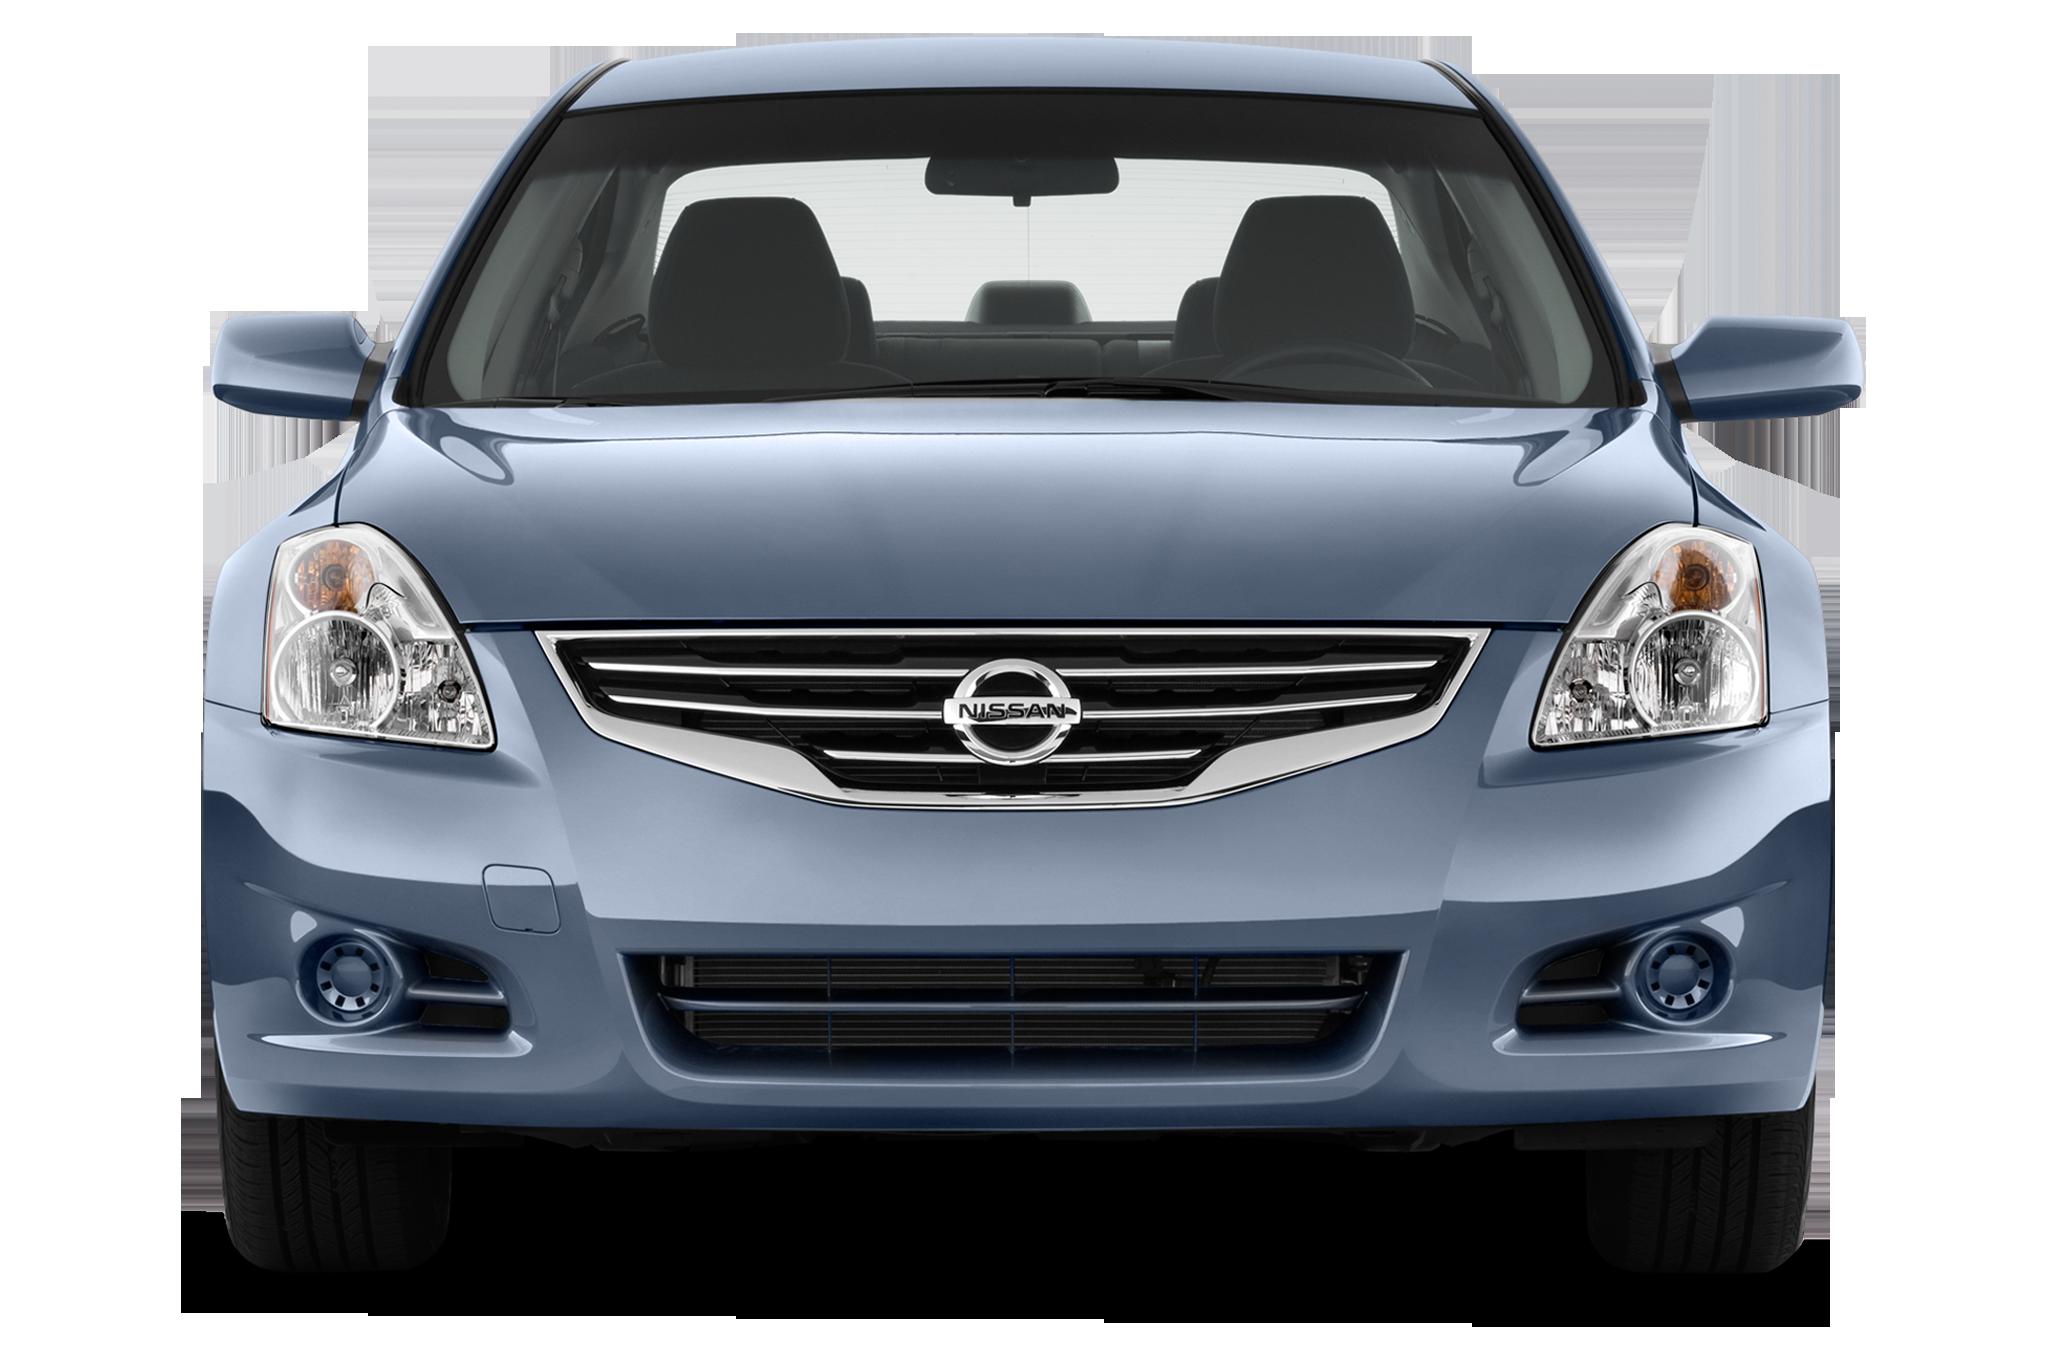 2010 Nissan Altima 3 5 Sr Nissan Midsize Sedan Review Automobile